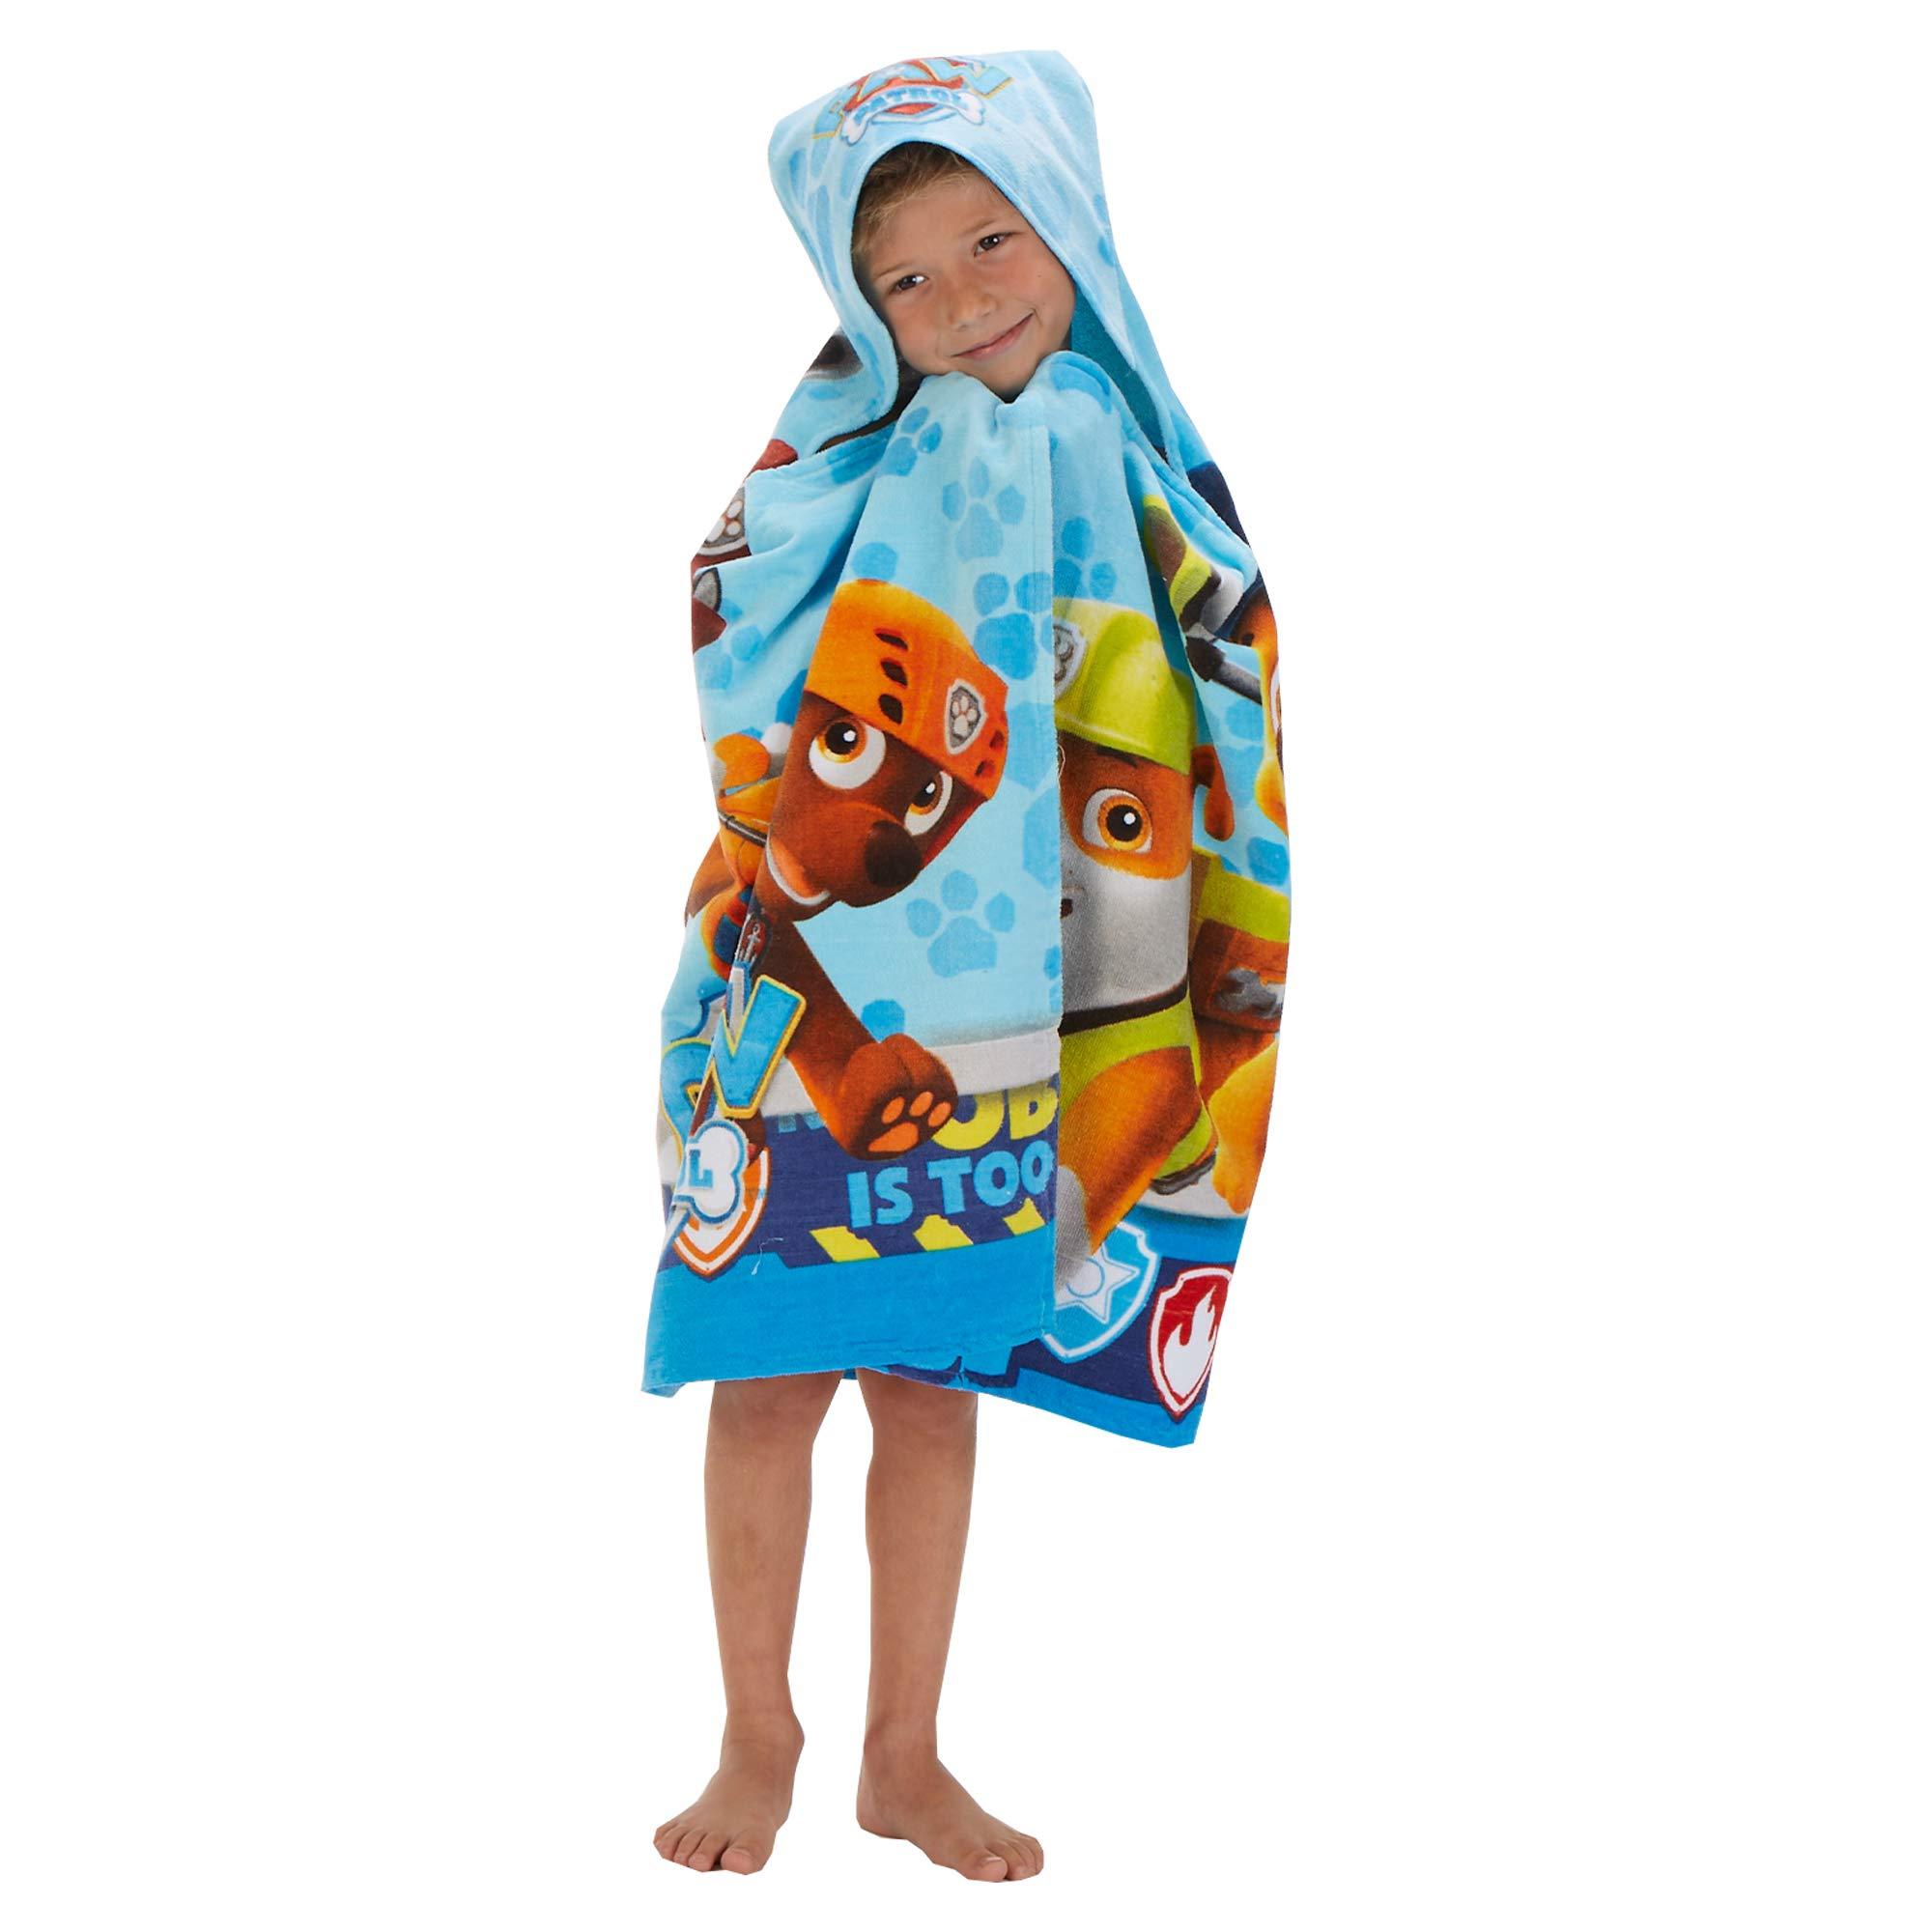 Franco Kids Bath and Beach Soft Cotton Terry Hooded Towel Wrap, 24'' x 50'', Paw Patrol Blue